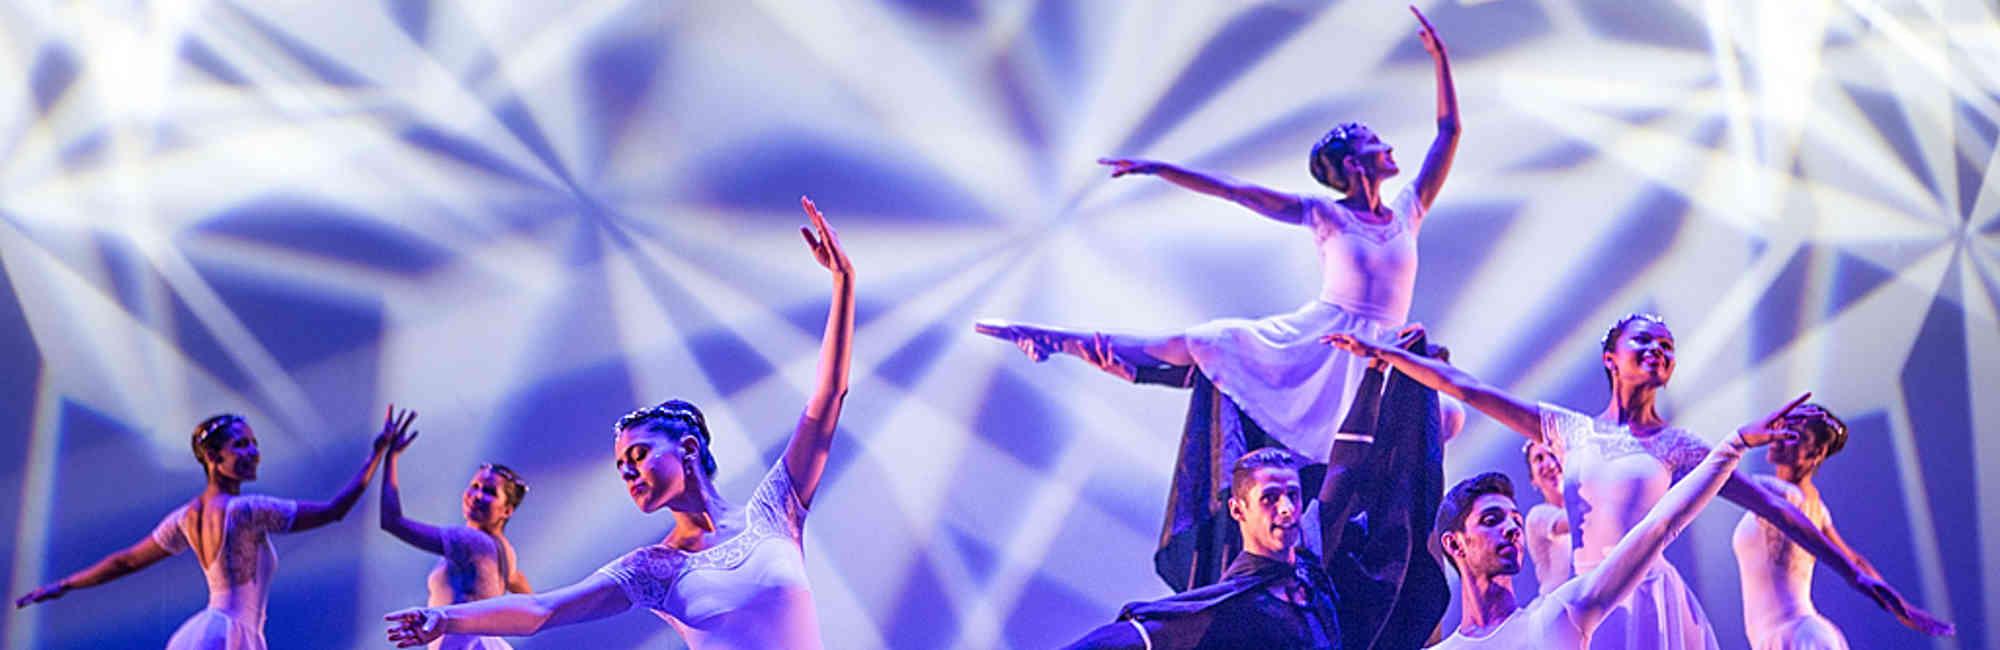 "Cia Ballet dos Cegos apresenta espetáculo ""Encantos"" neste domingo (14/10)"